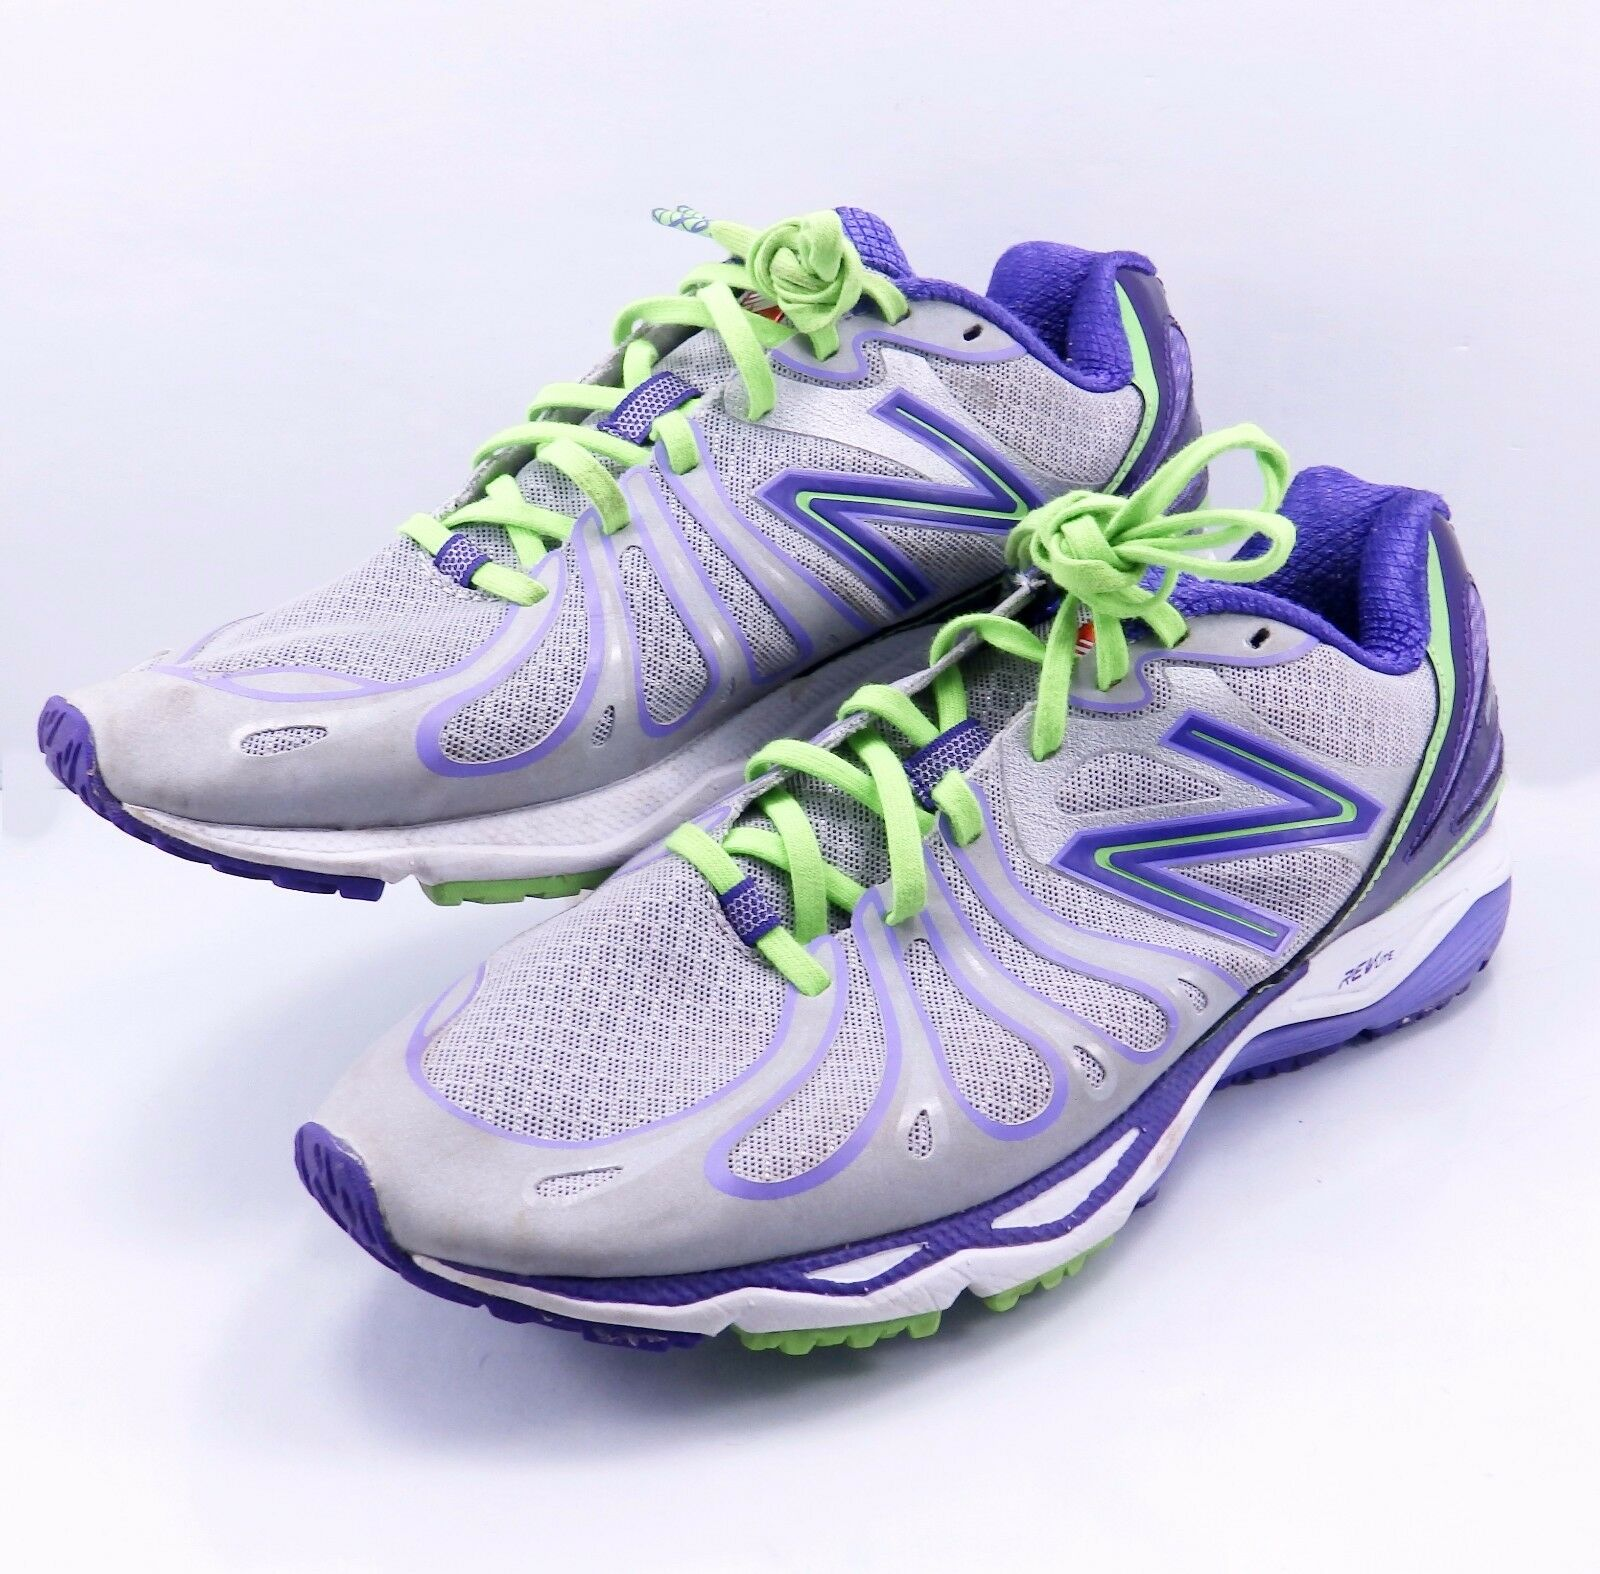 NEW BALANCE W890SP3 Womens  shoes  REV LITE  FITNESS Size 9.5 EXUC